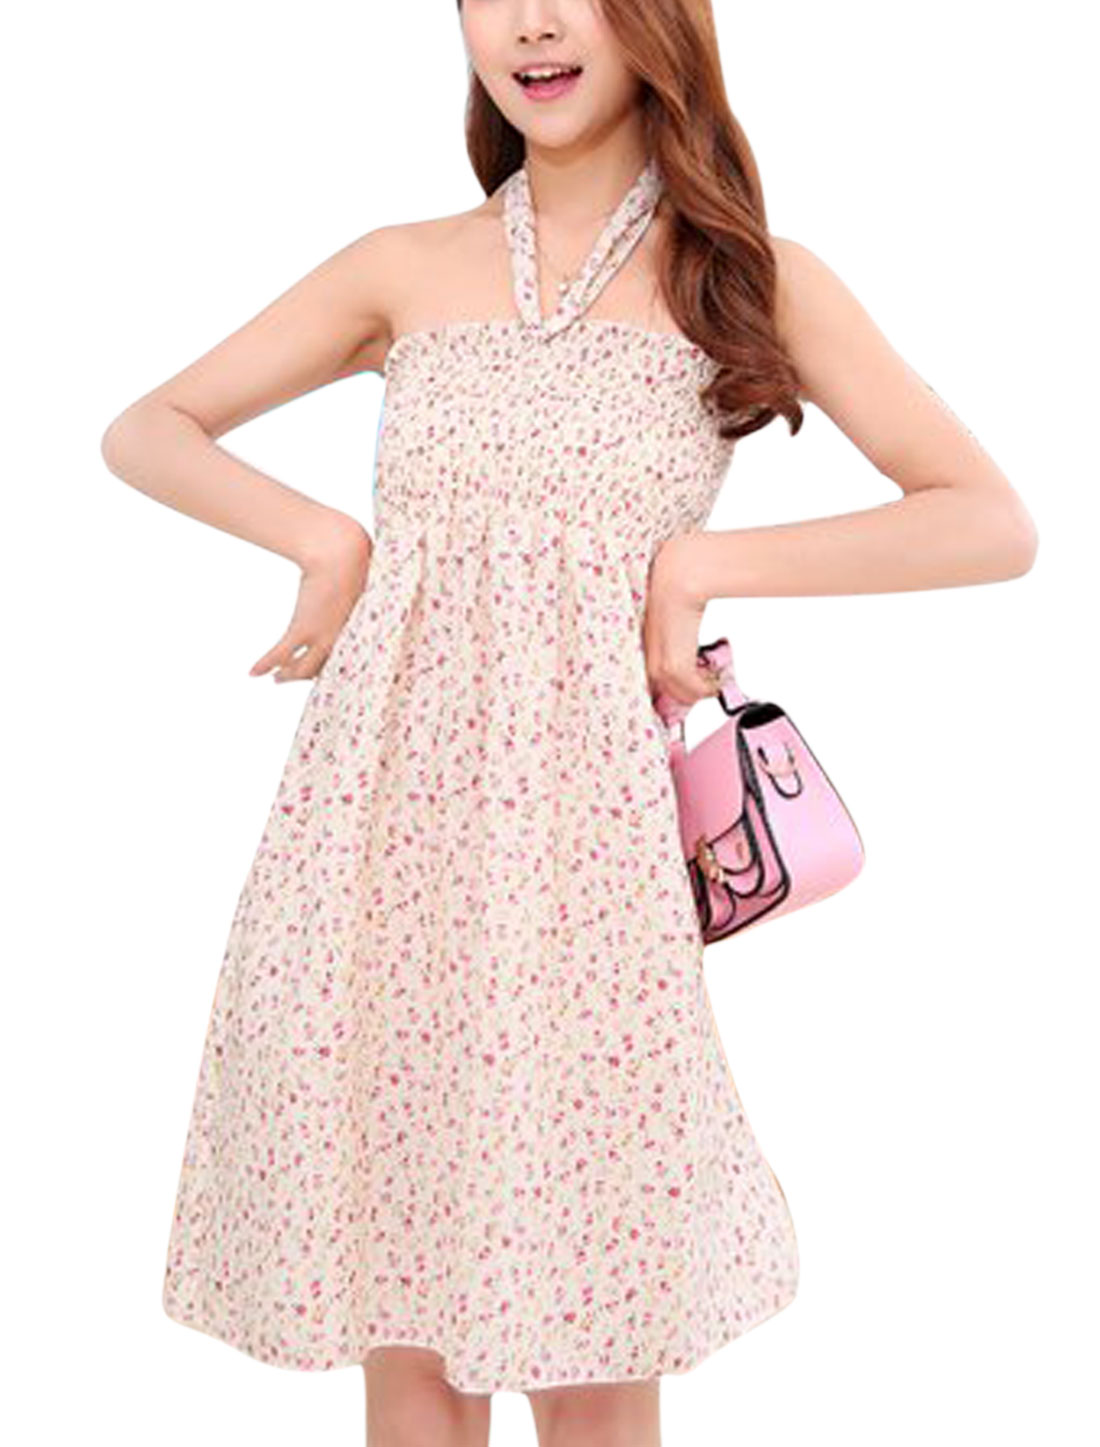 Ladies Halter Neck Floral Print Smocked Bust Ruched Dress Beige Fuchisa S